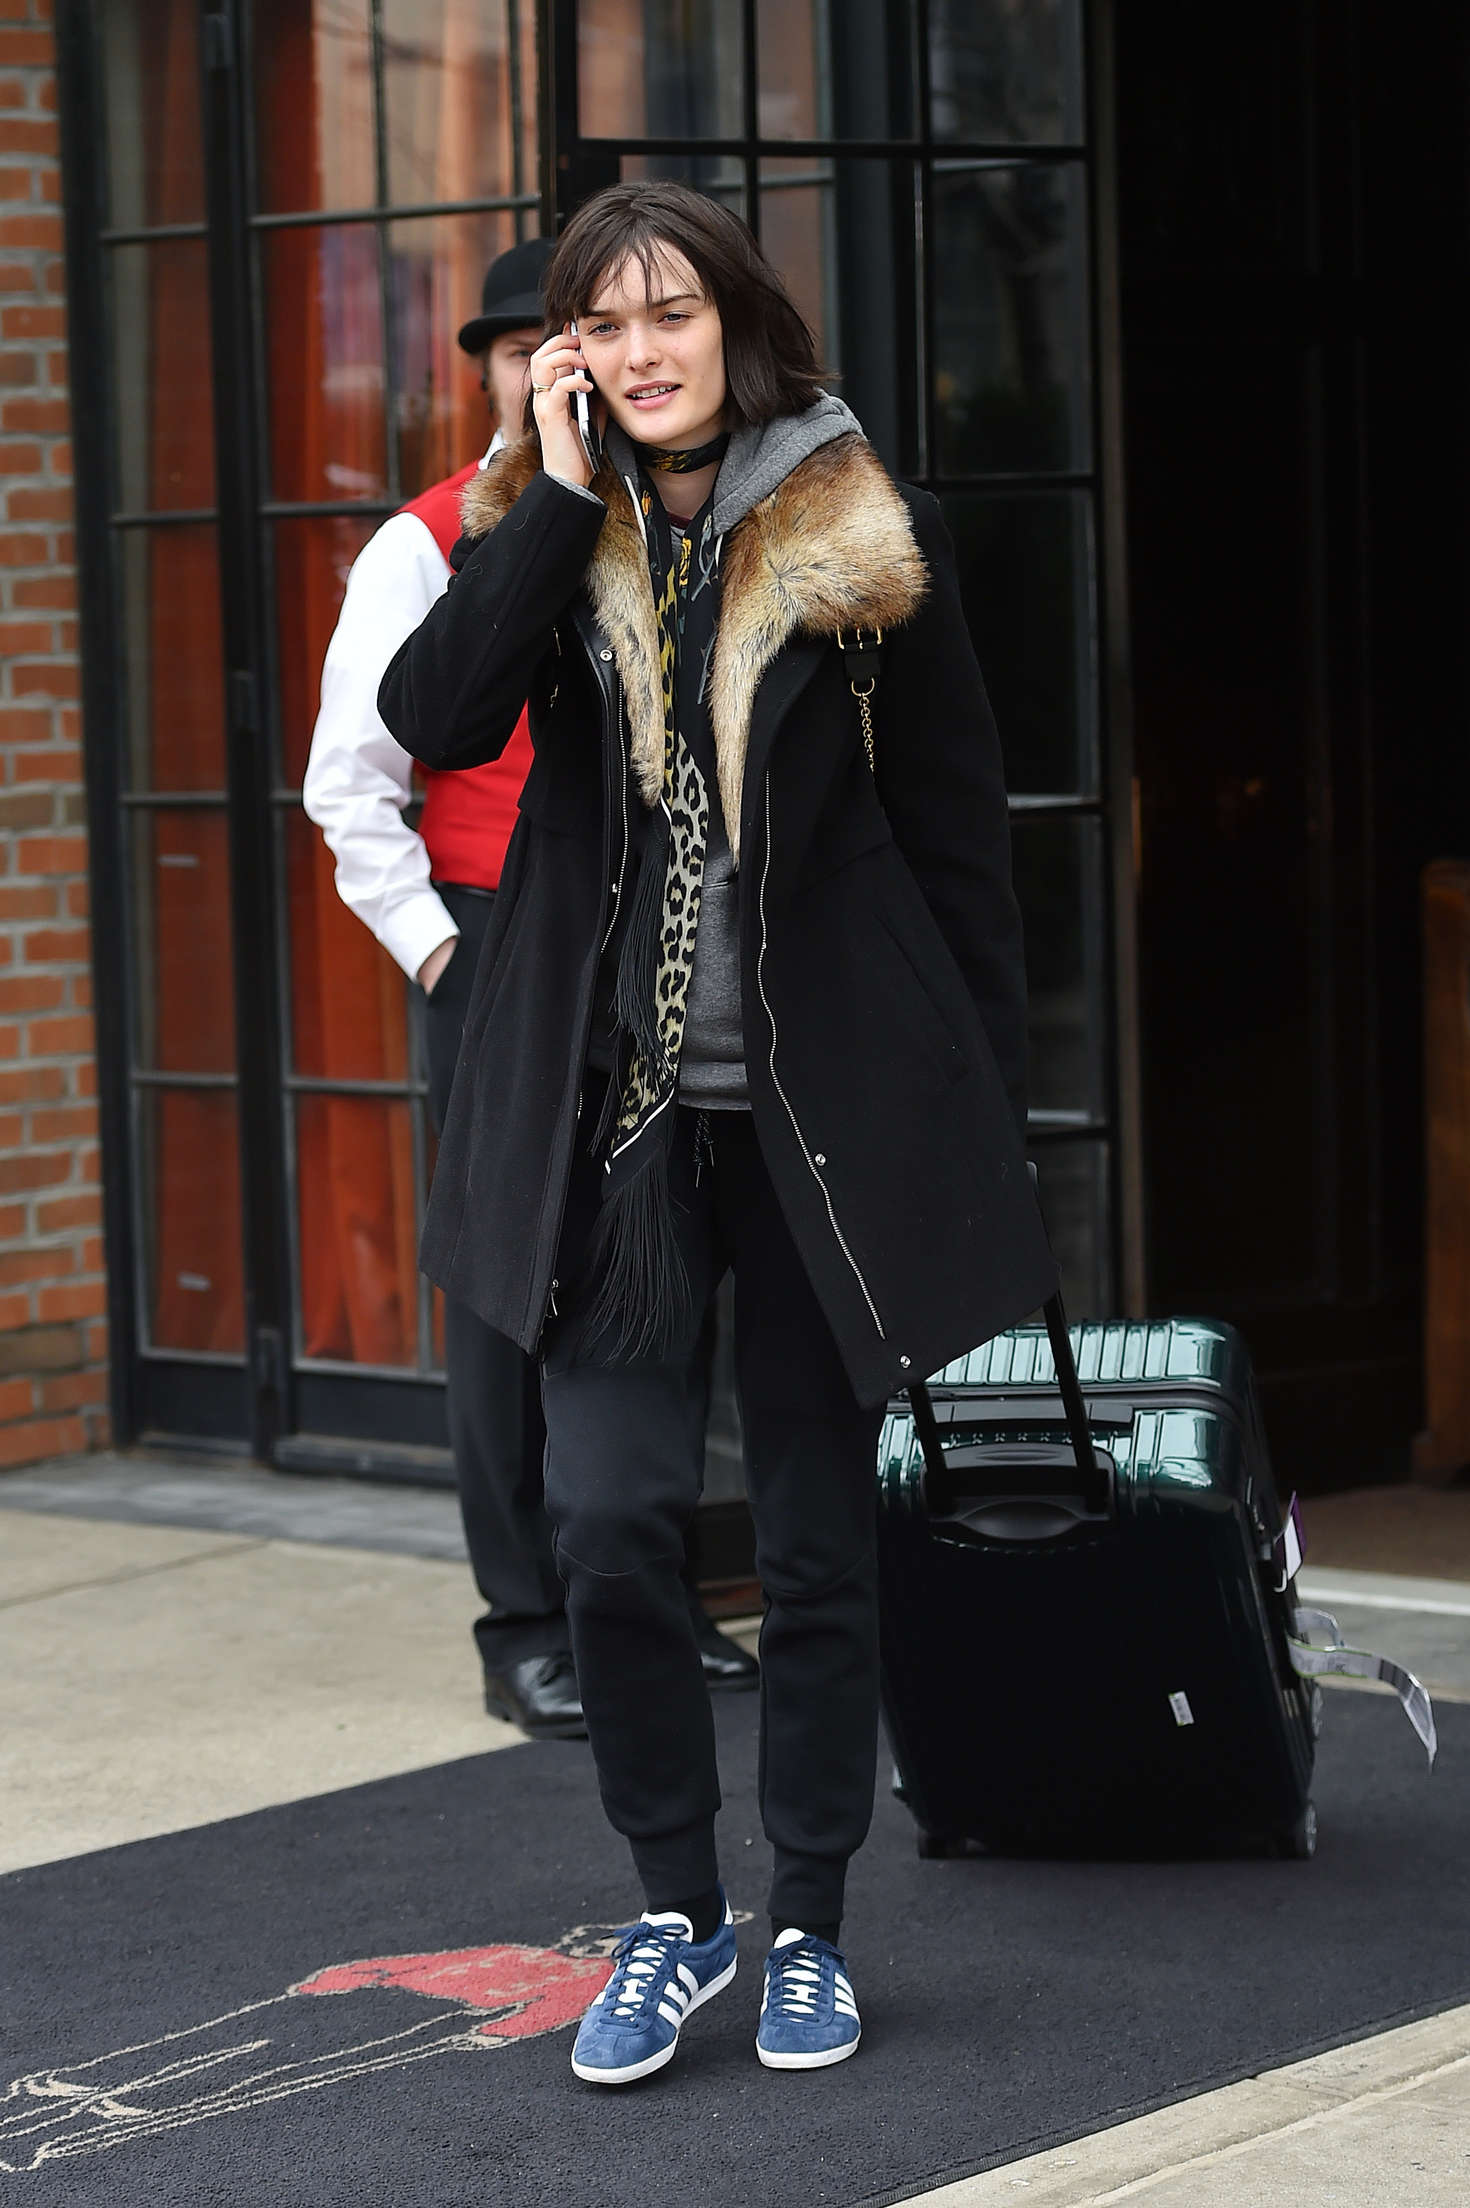 Ali Lohan Leaves East Village Hotel in New York